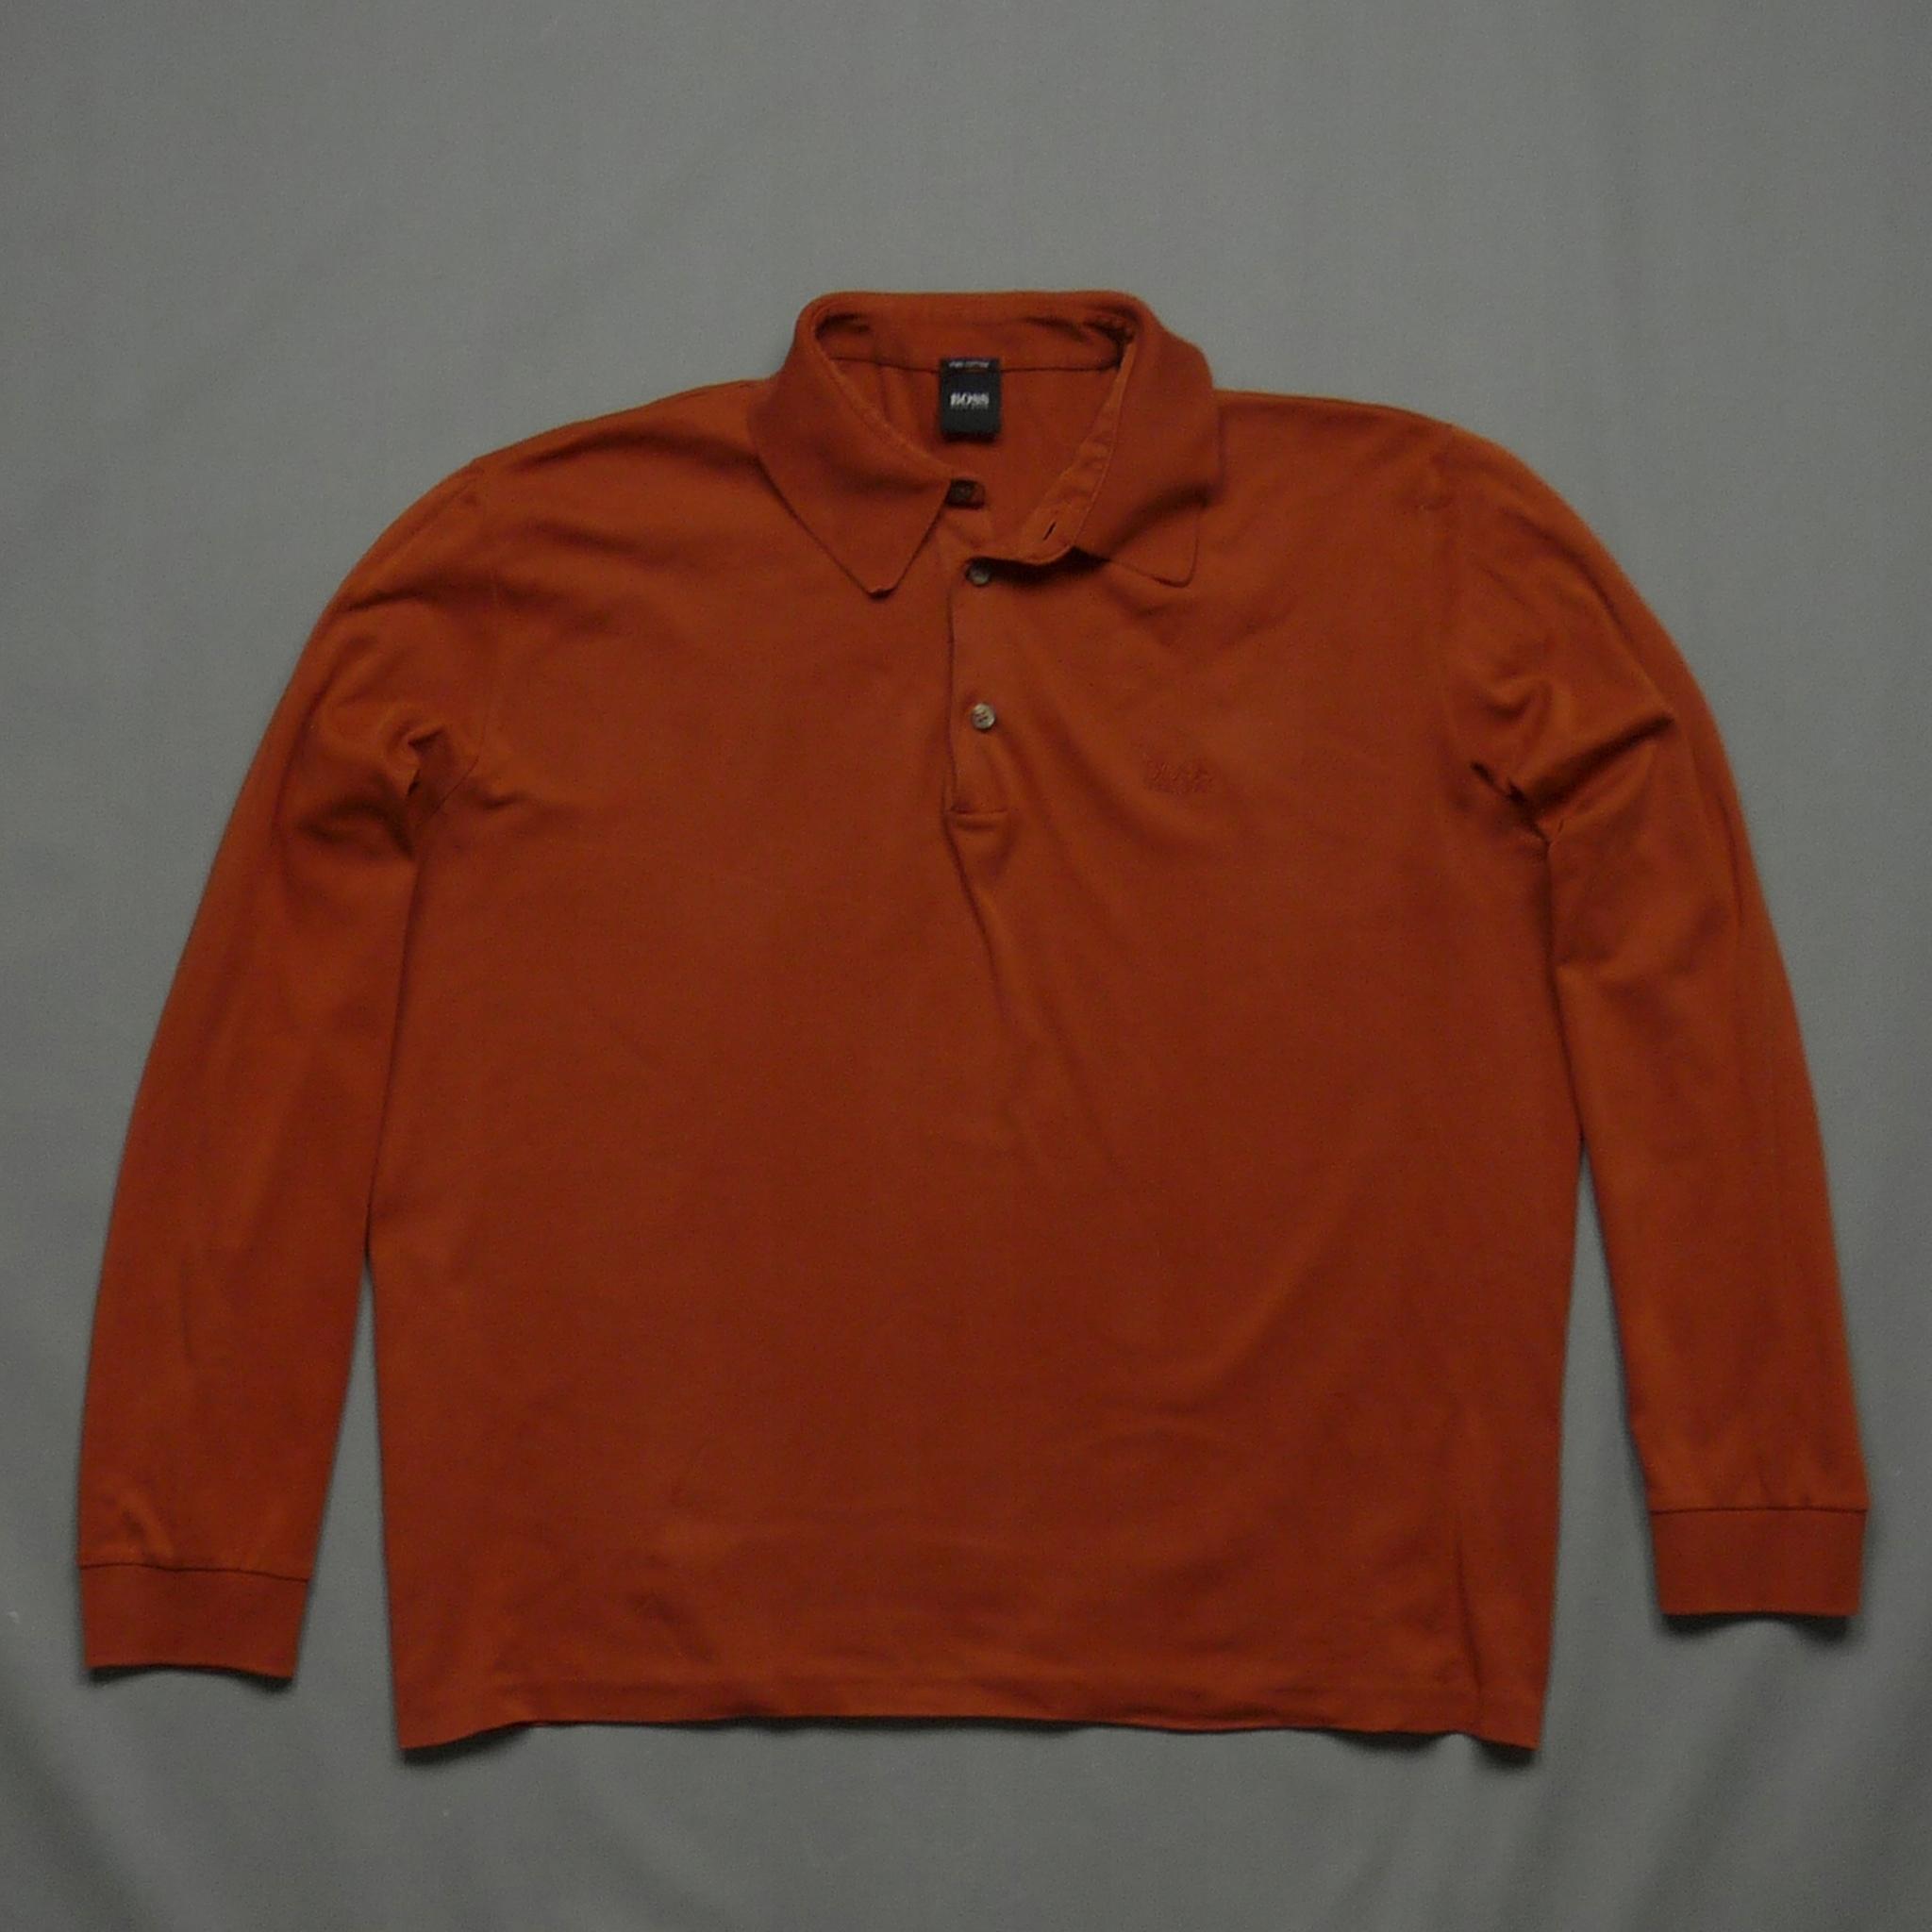 HUGO BOSS koszulka longsleeve Pima Cotton z logo L